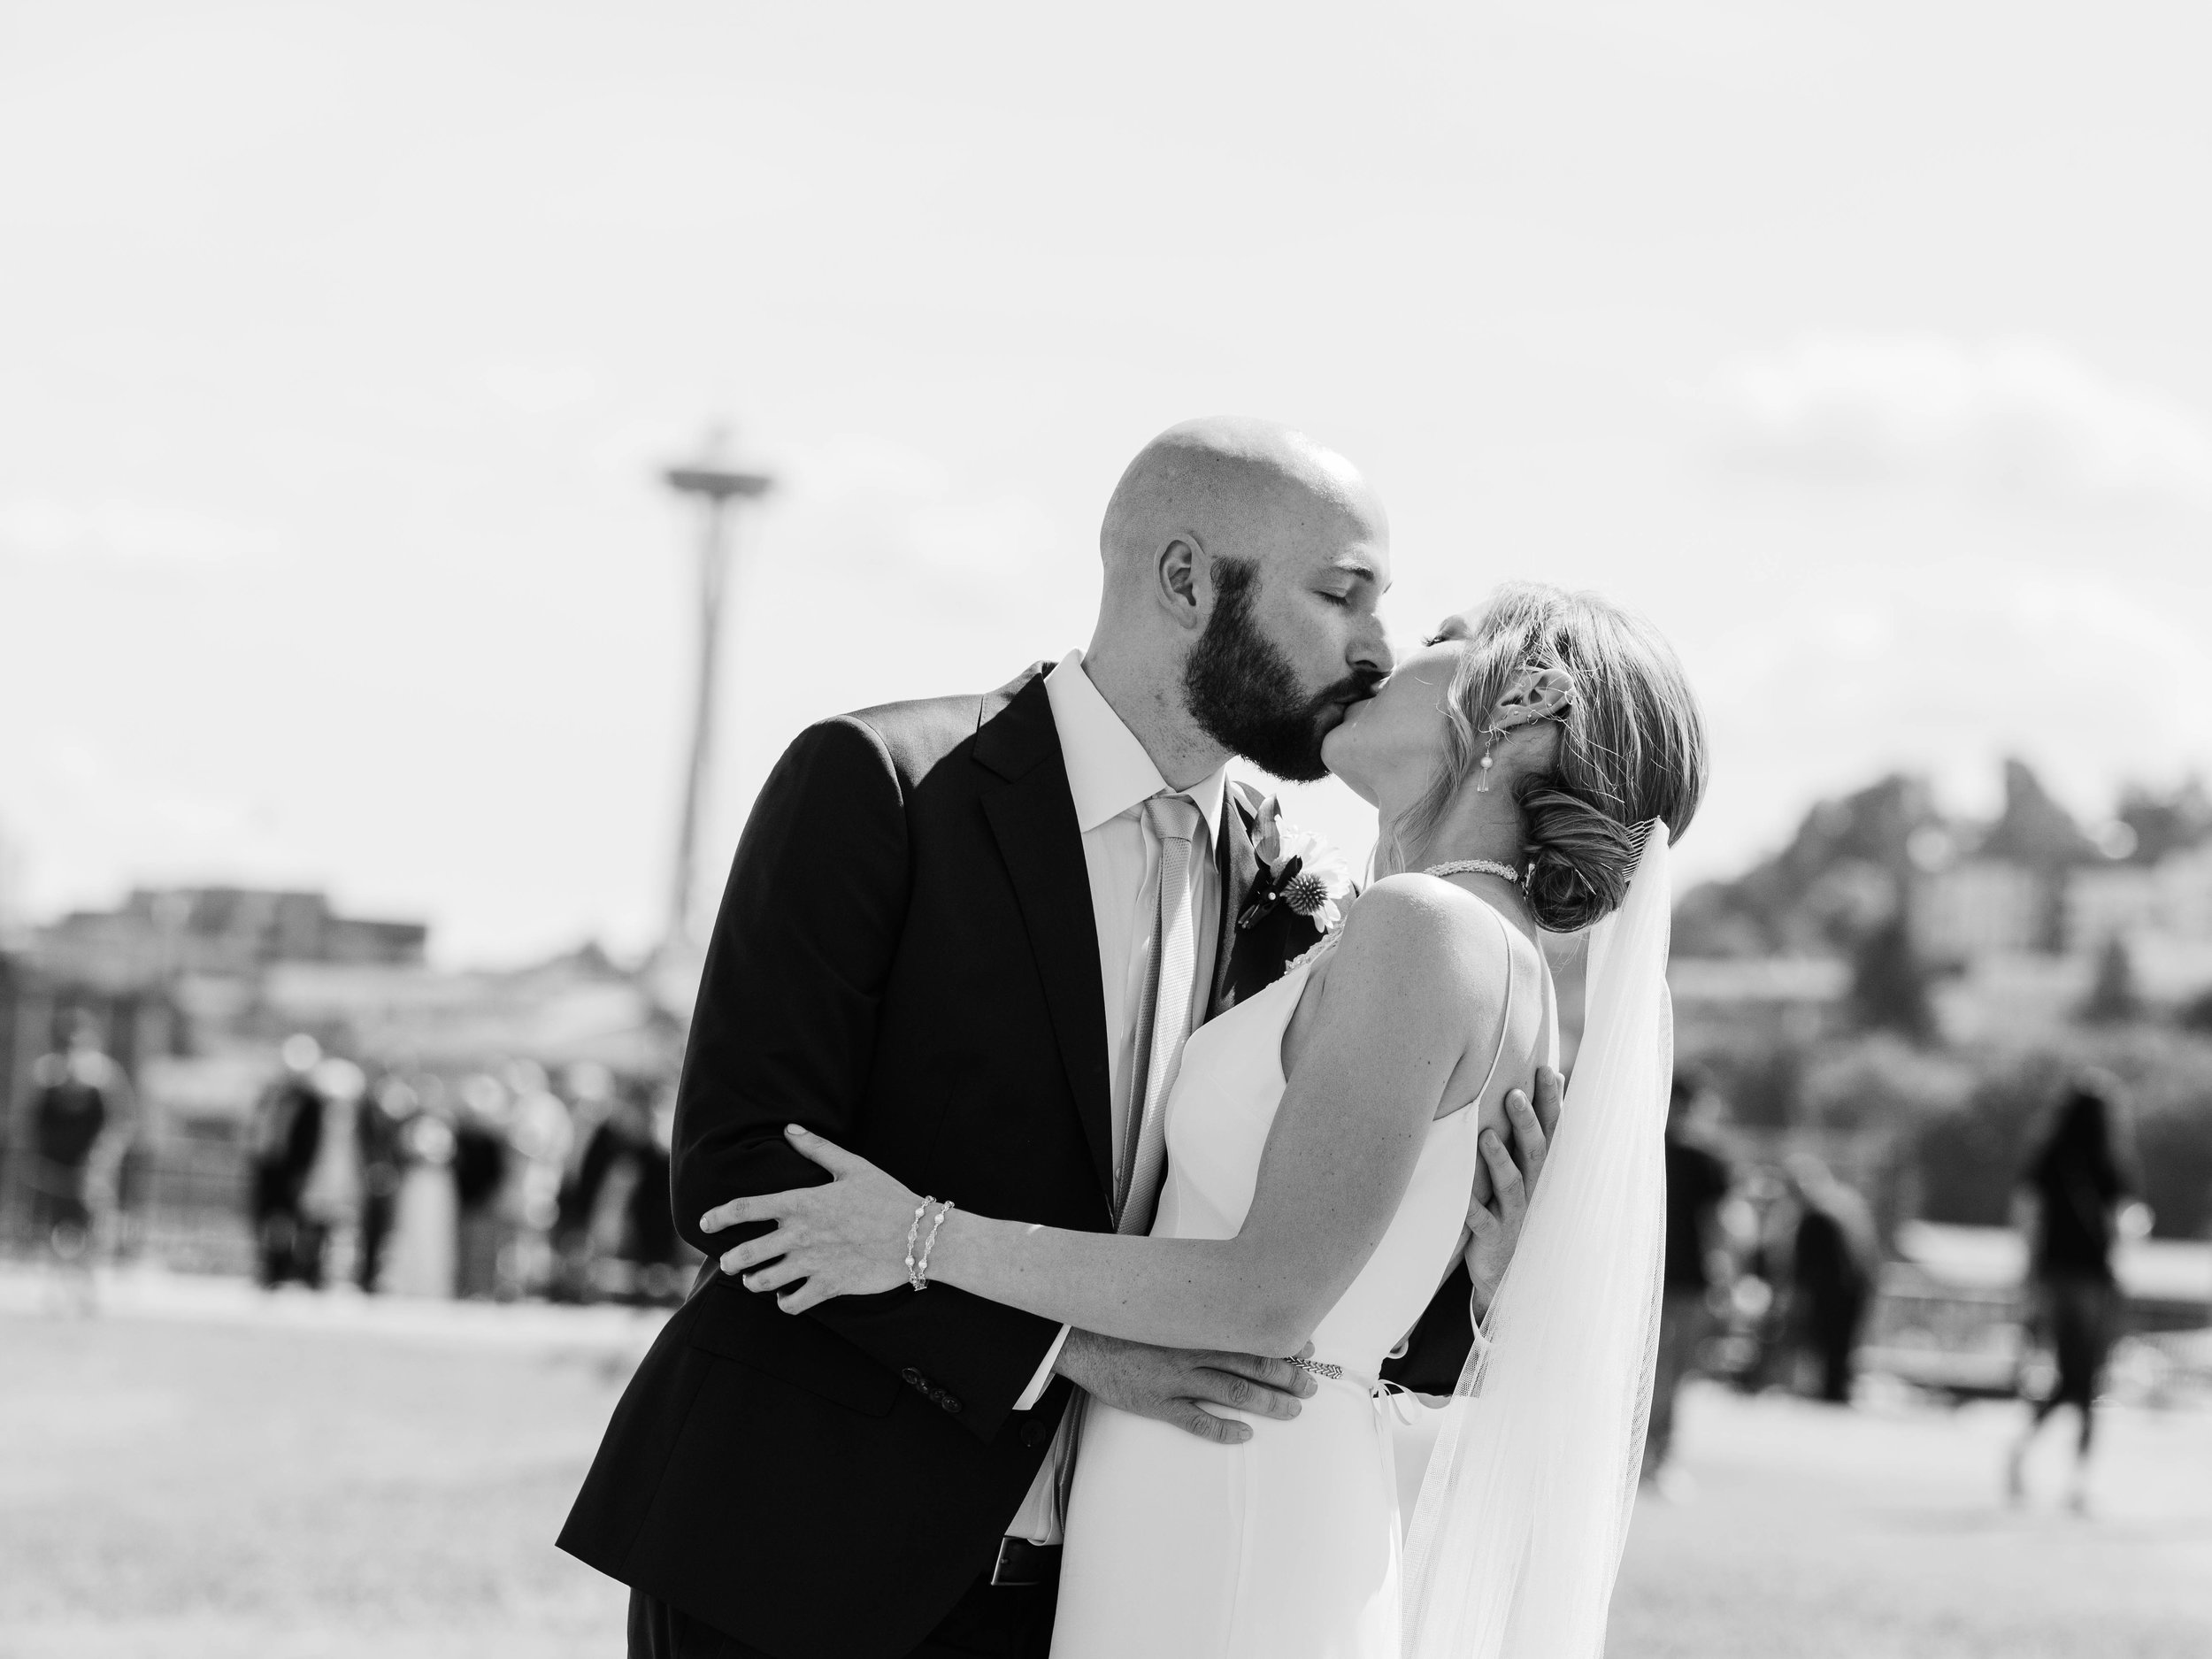 Seattle Wedding- MV Skansonia - Anna + Josh -  (852) - Copy.jpg